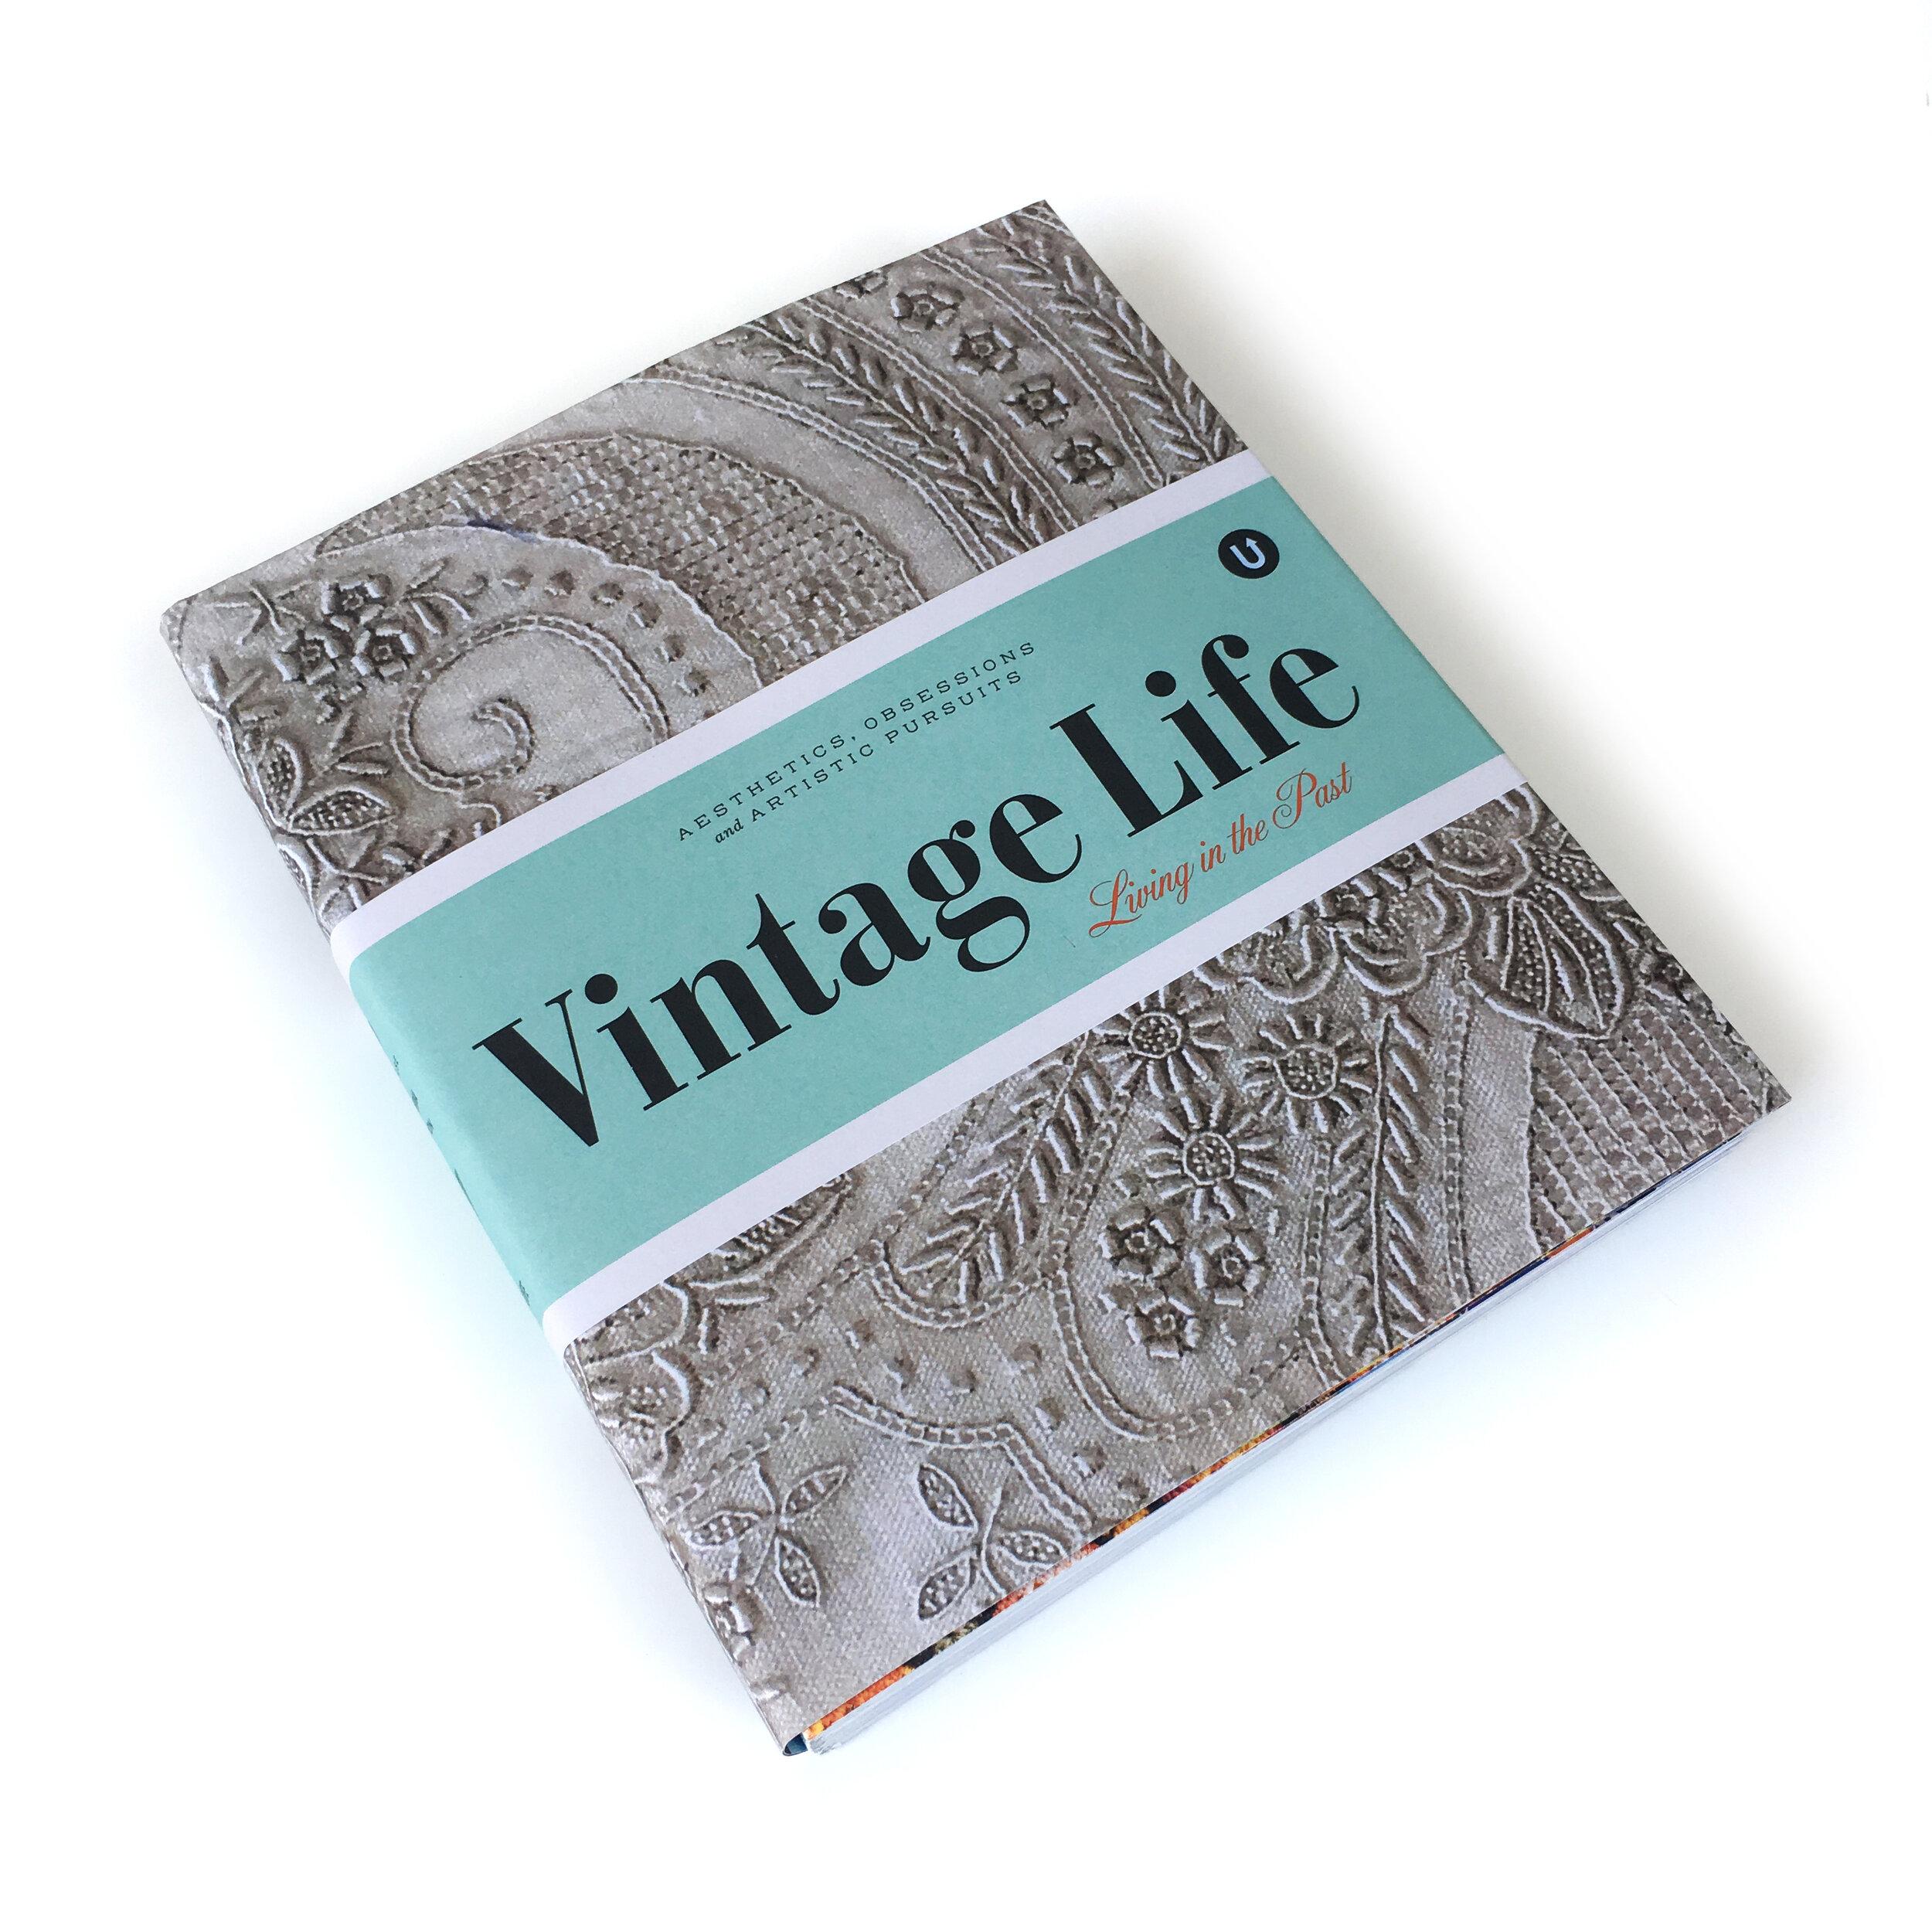 VintageLife-dustjackets-3.JPG